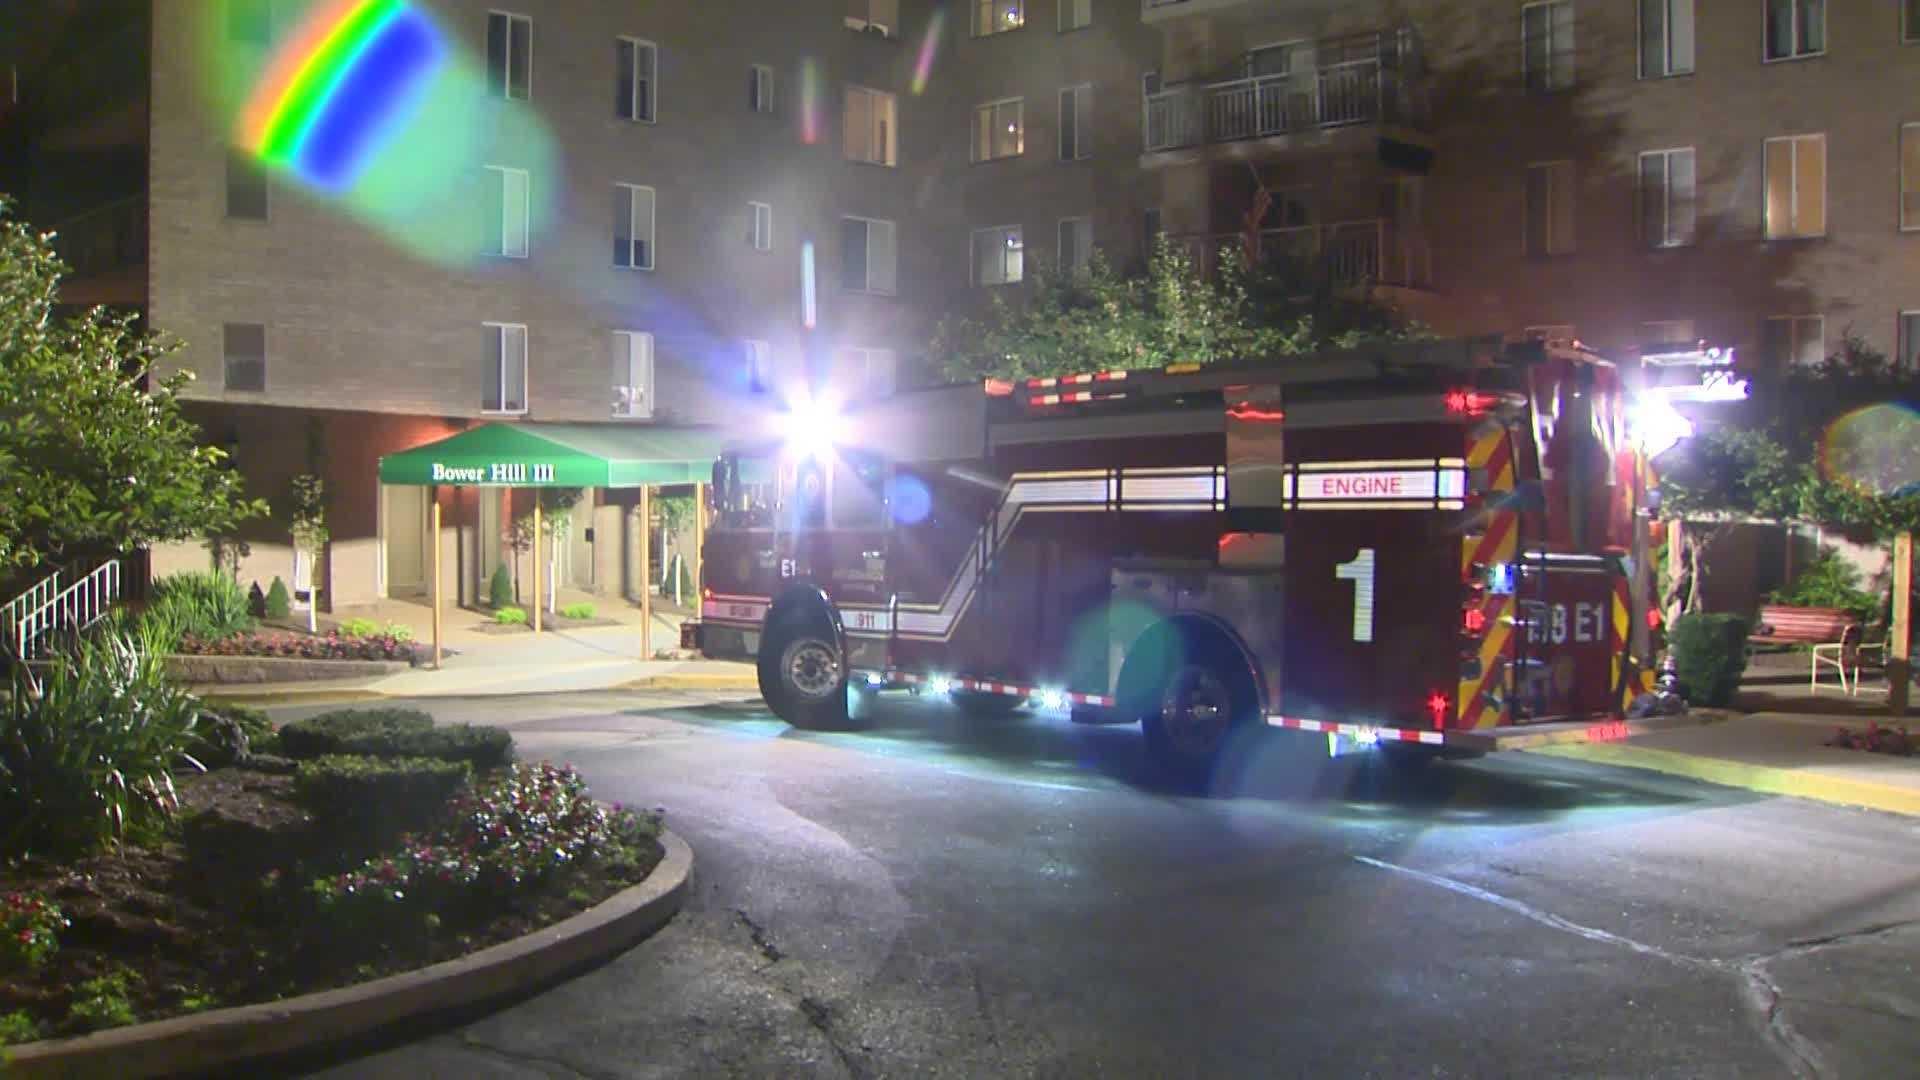 fire truck at Bowel Hill Apartments